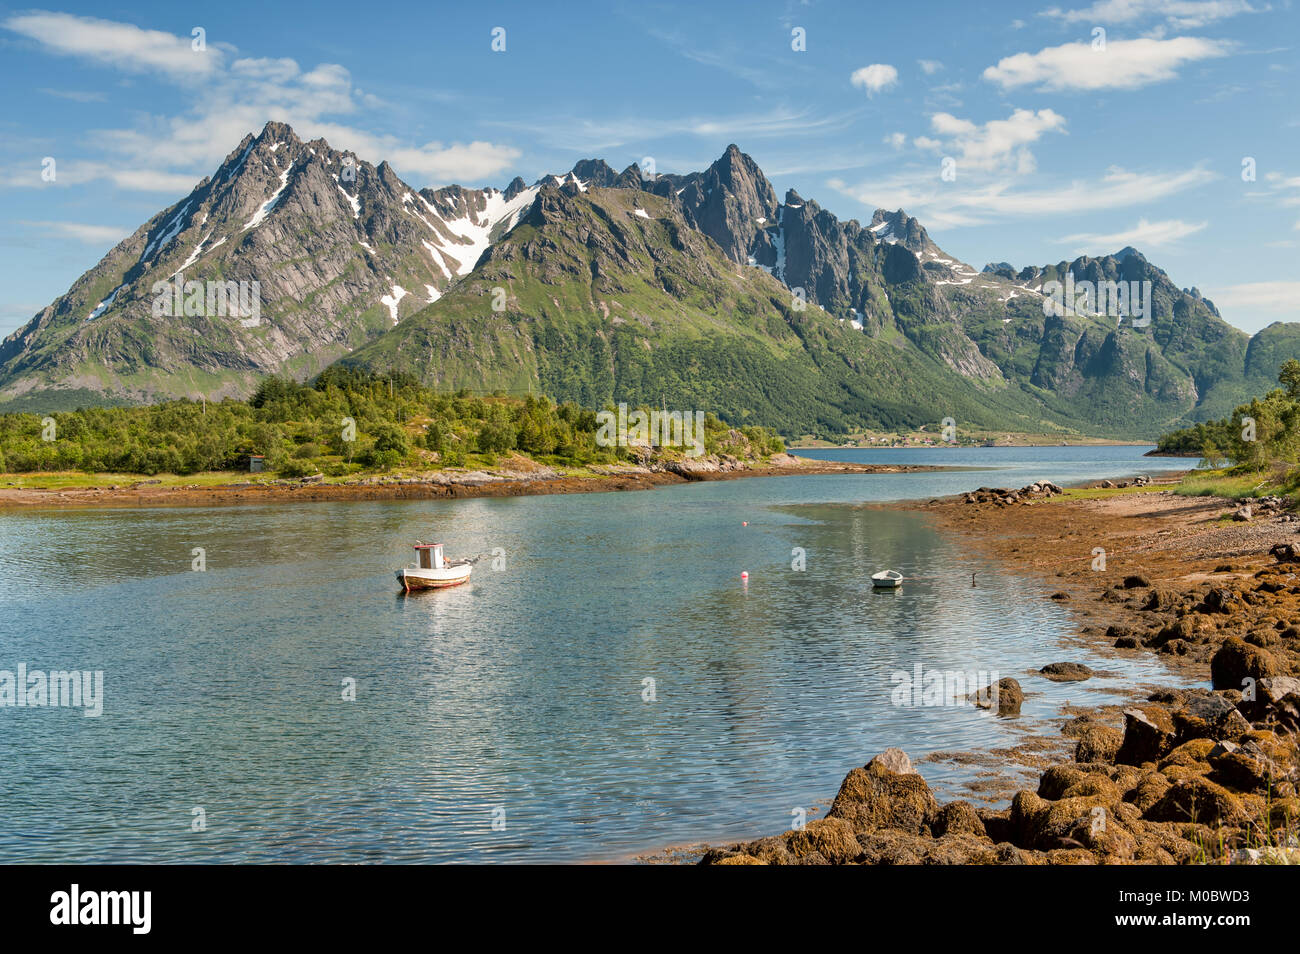 Coast landscape during summer on Lofoten islands in northern Norway. Lofoten is a popular tourist destination. Stock Photo